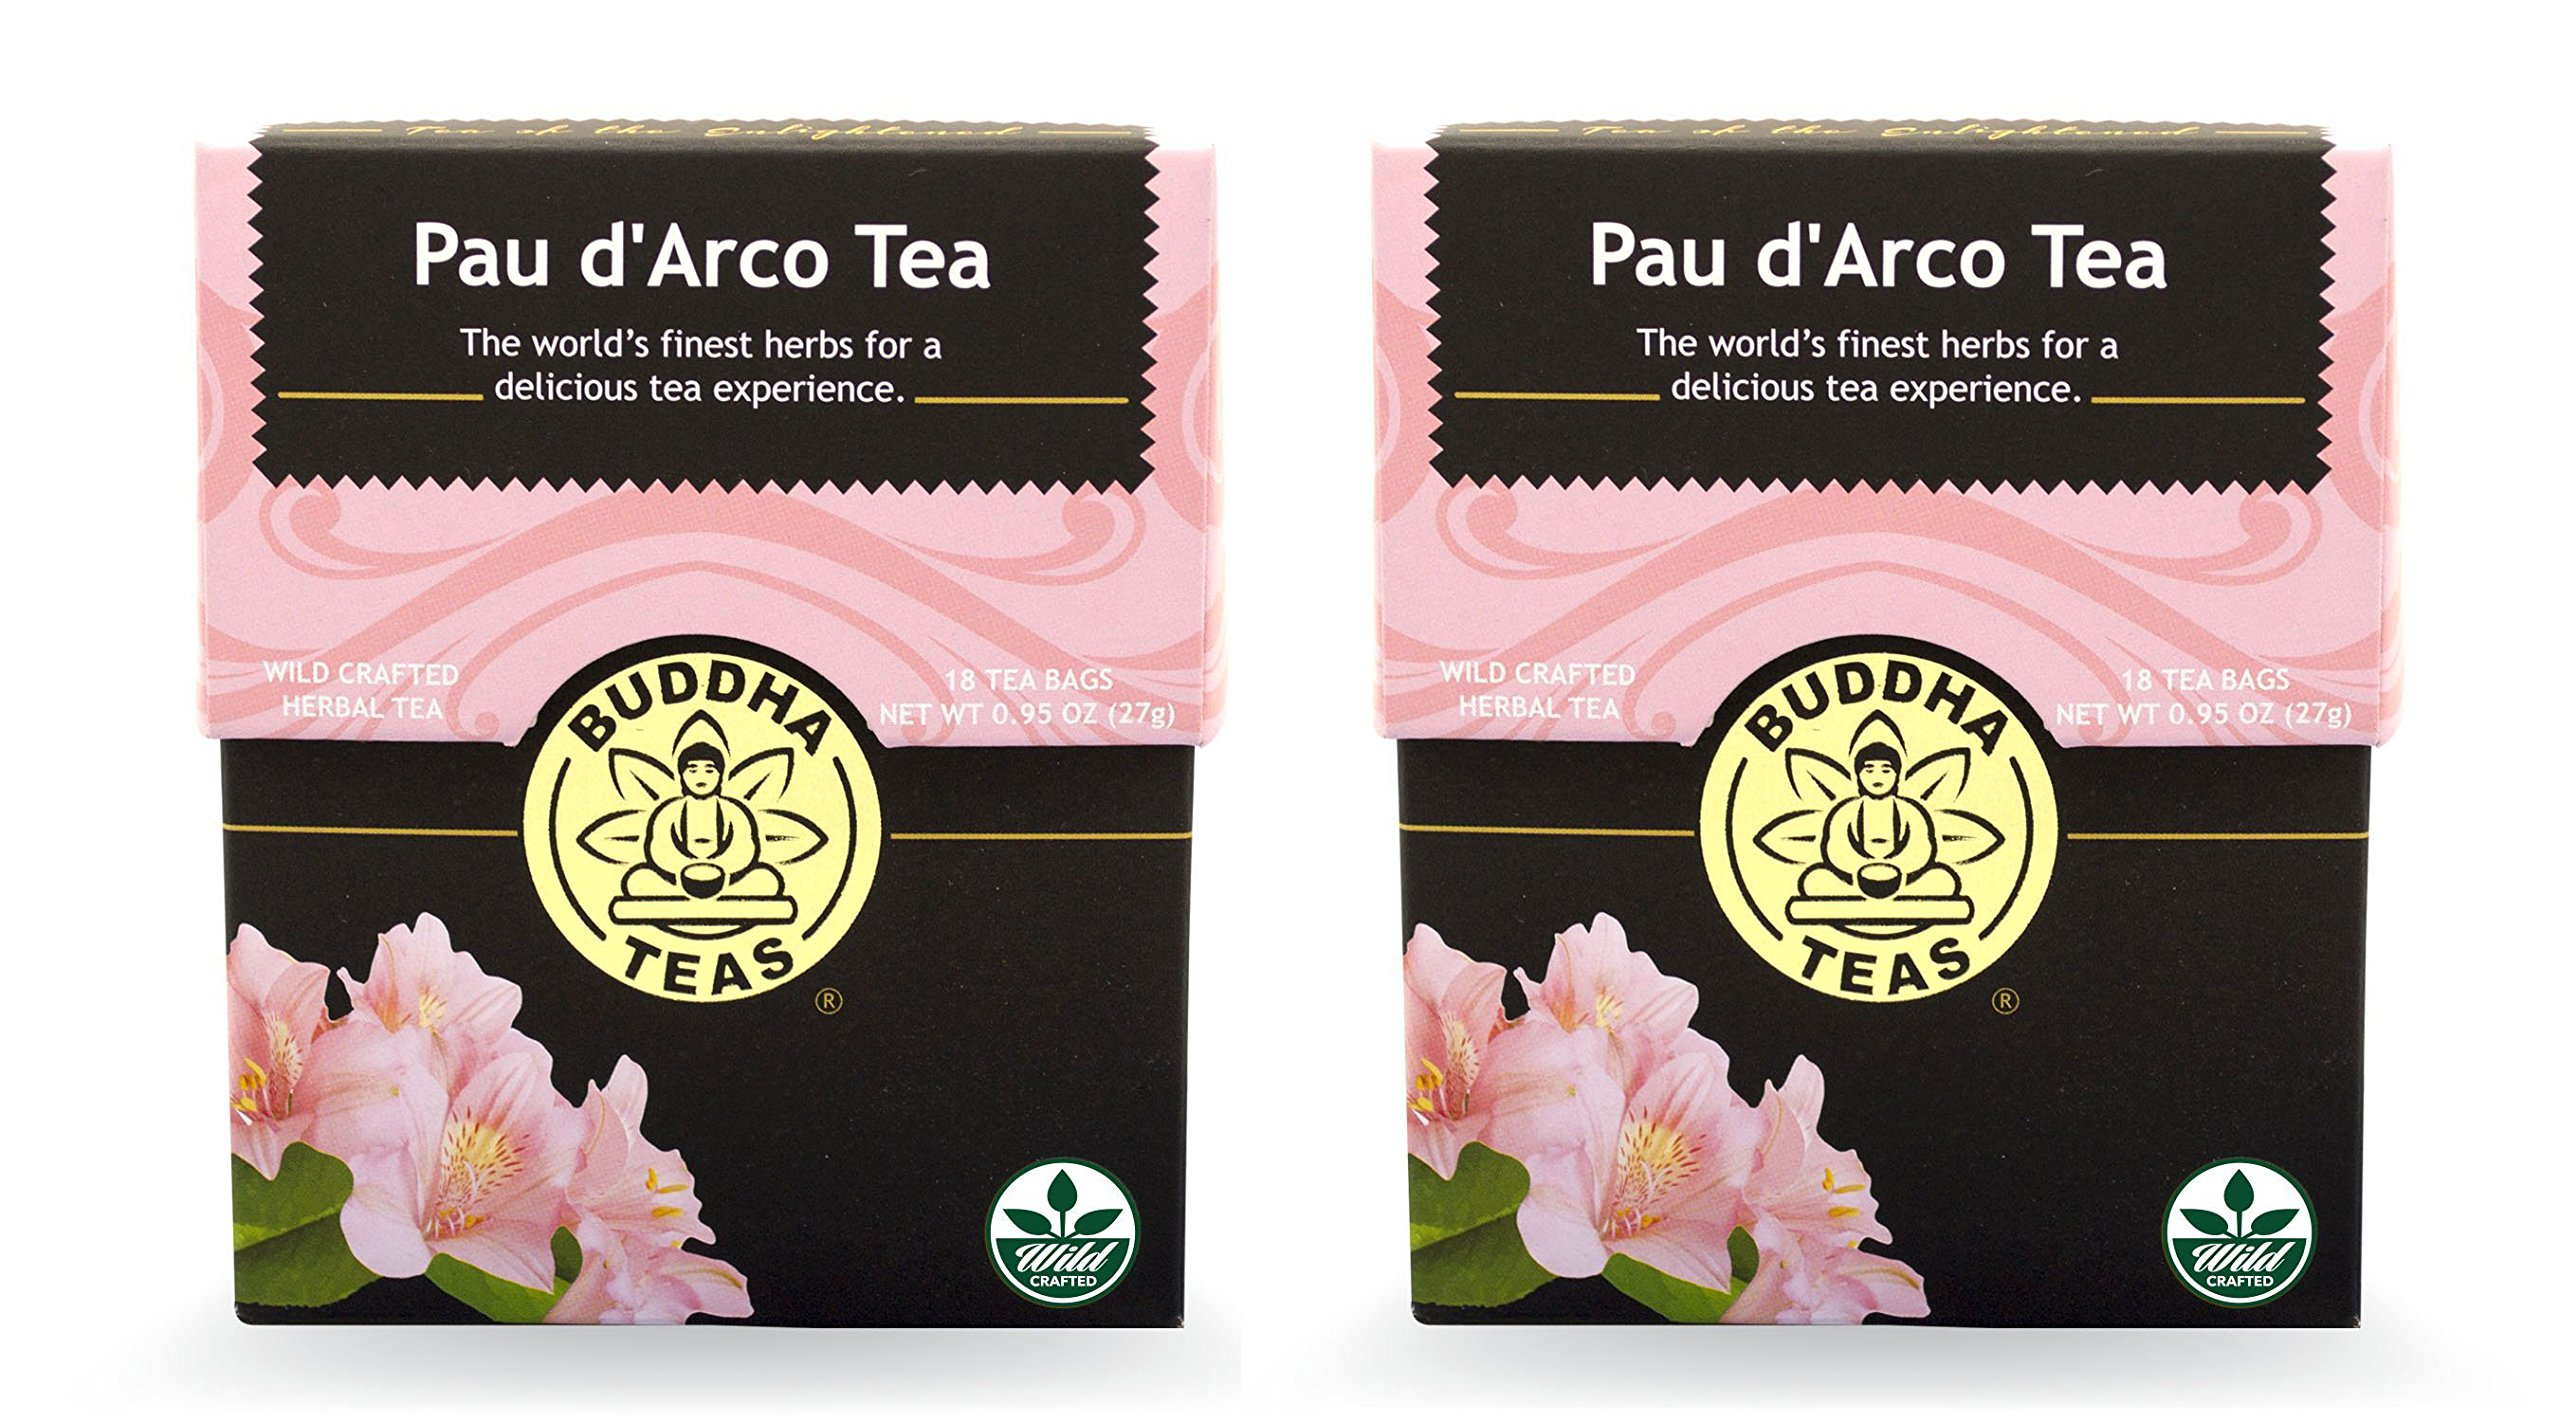 Pau D'arco Tea - Wild Harvested, Kosher, Caffeine Free, GMO-Free - 18 Bleach Free Tea Bags (2 pack)